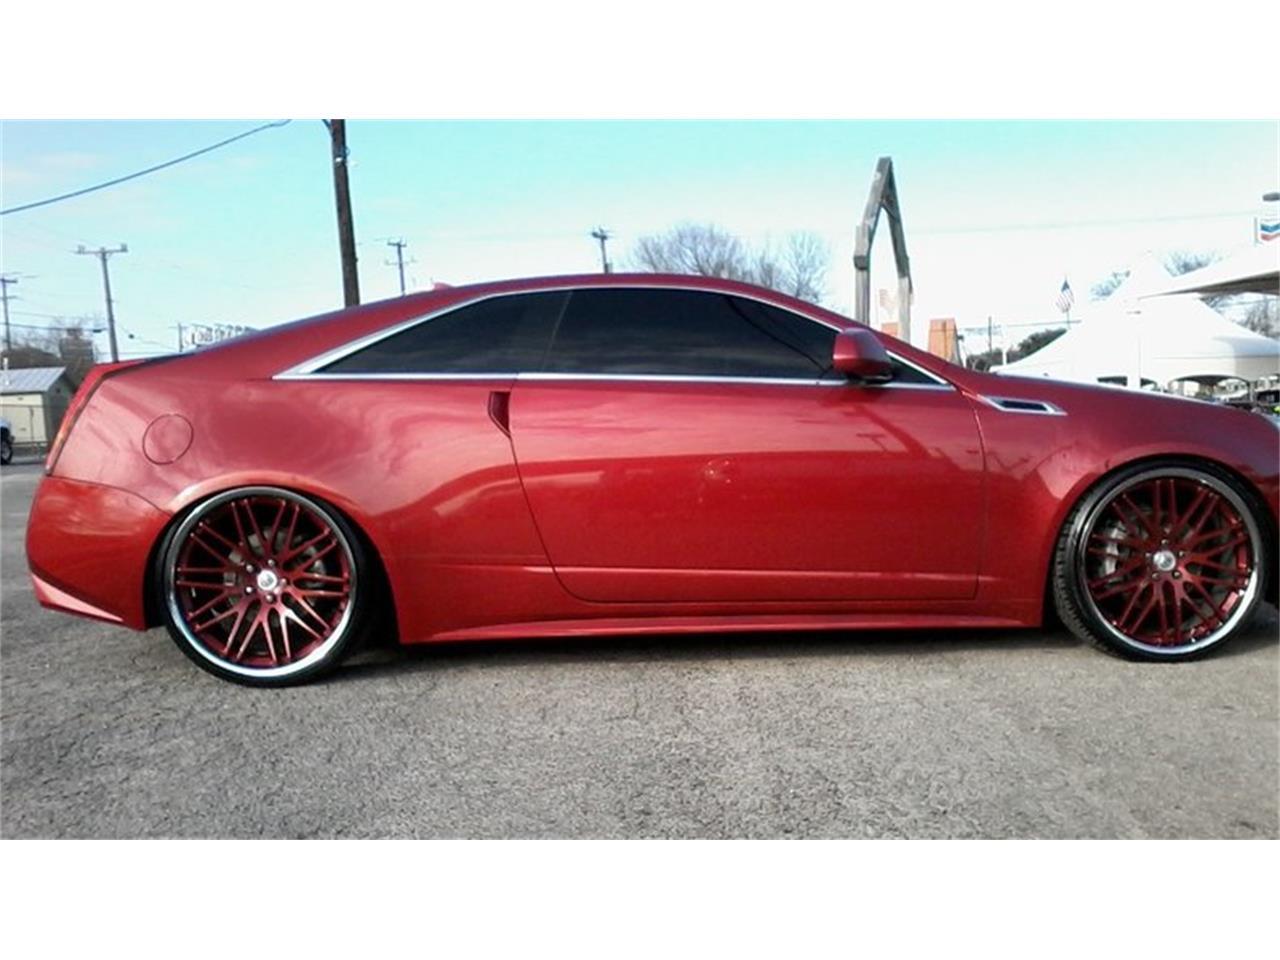 2012 Cadillac Cts Custom For Sale